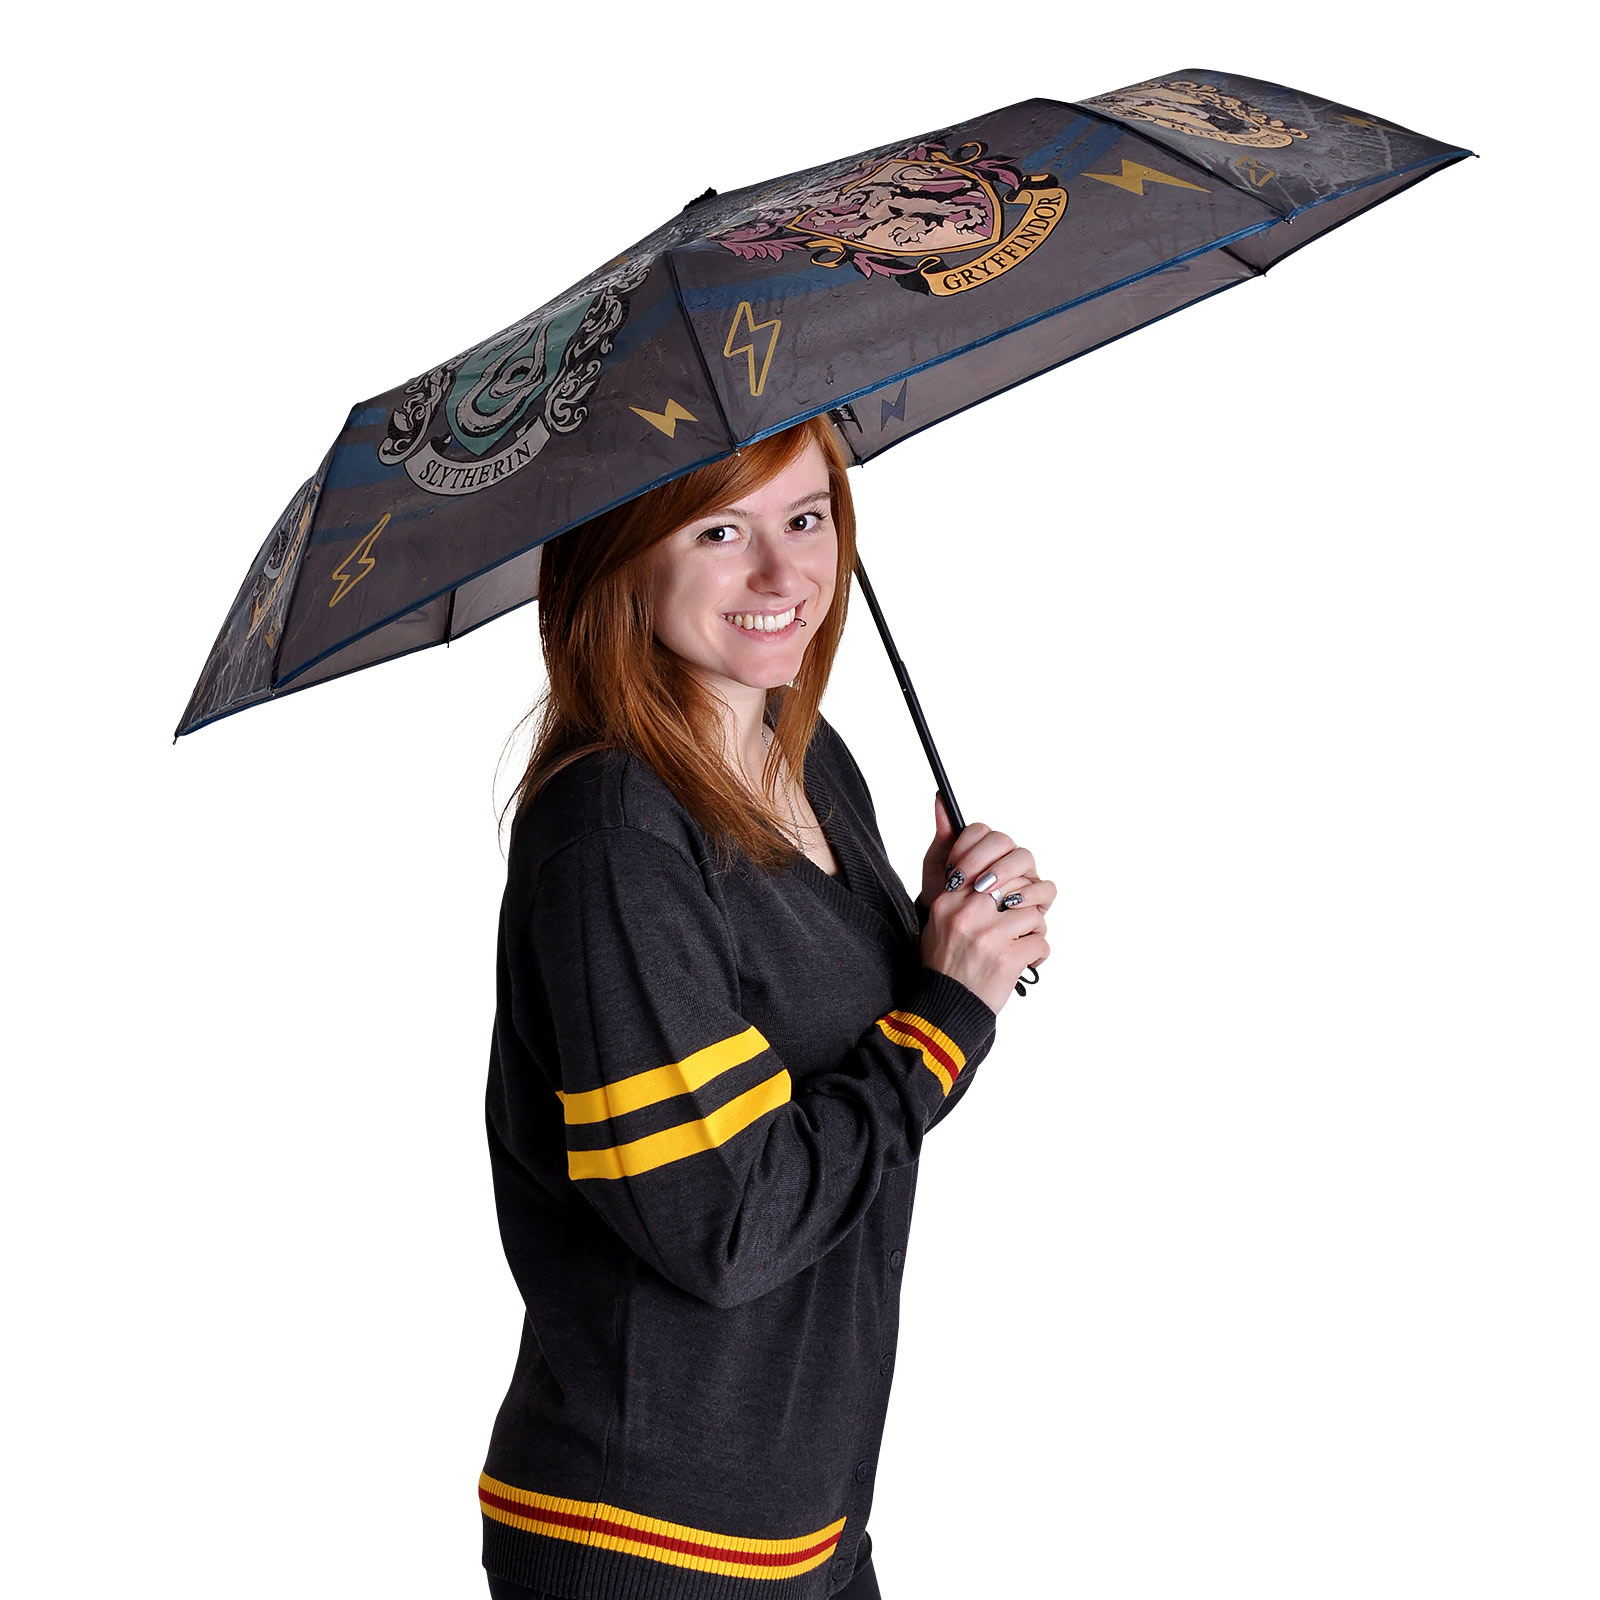 Harry Potter - Hogwarts Häuser Wappen Schirm mit Aqua Effekt